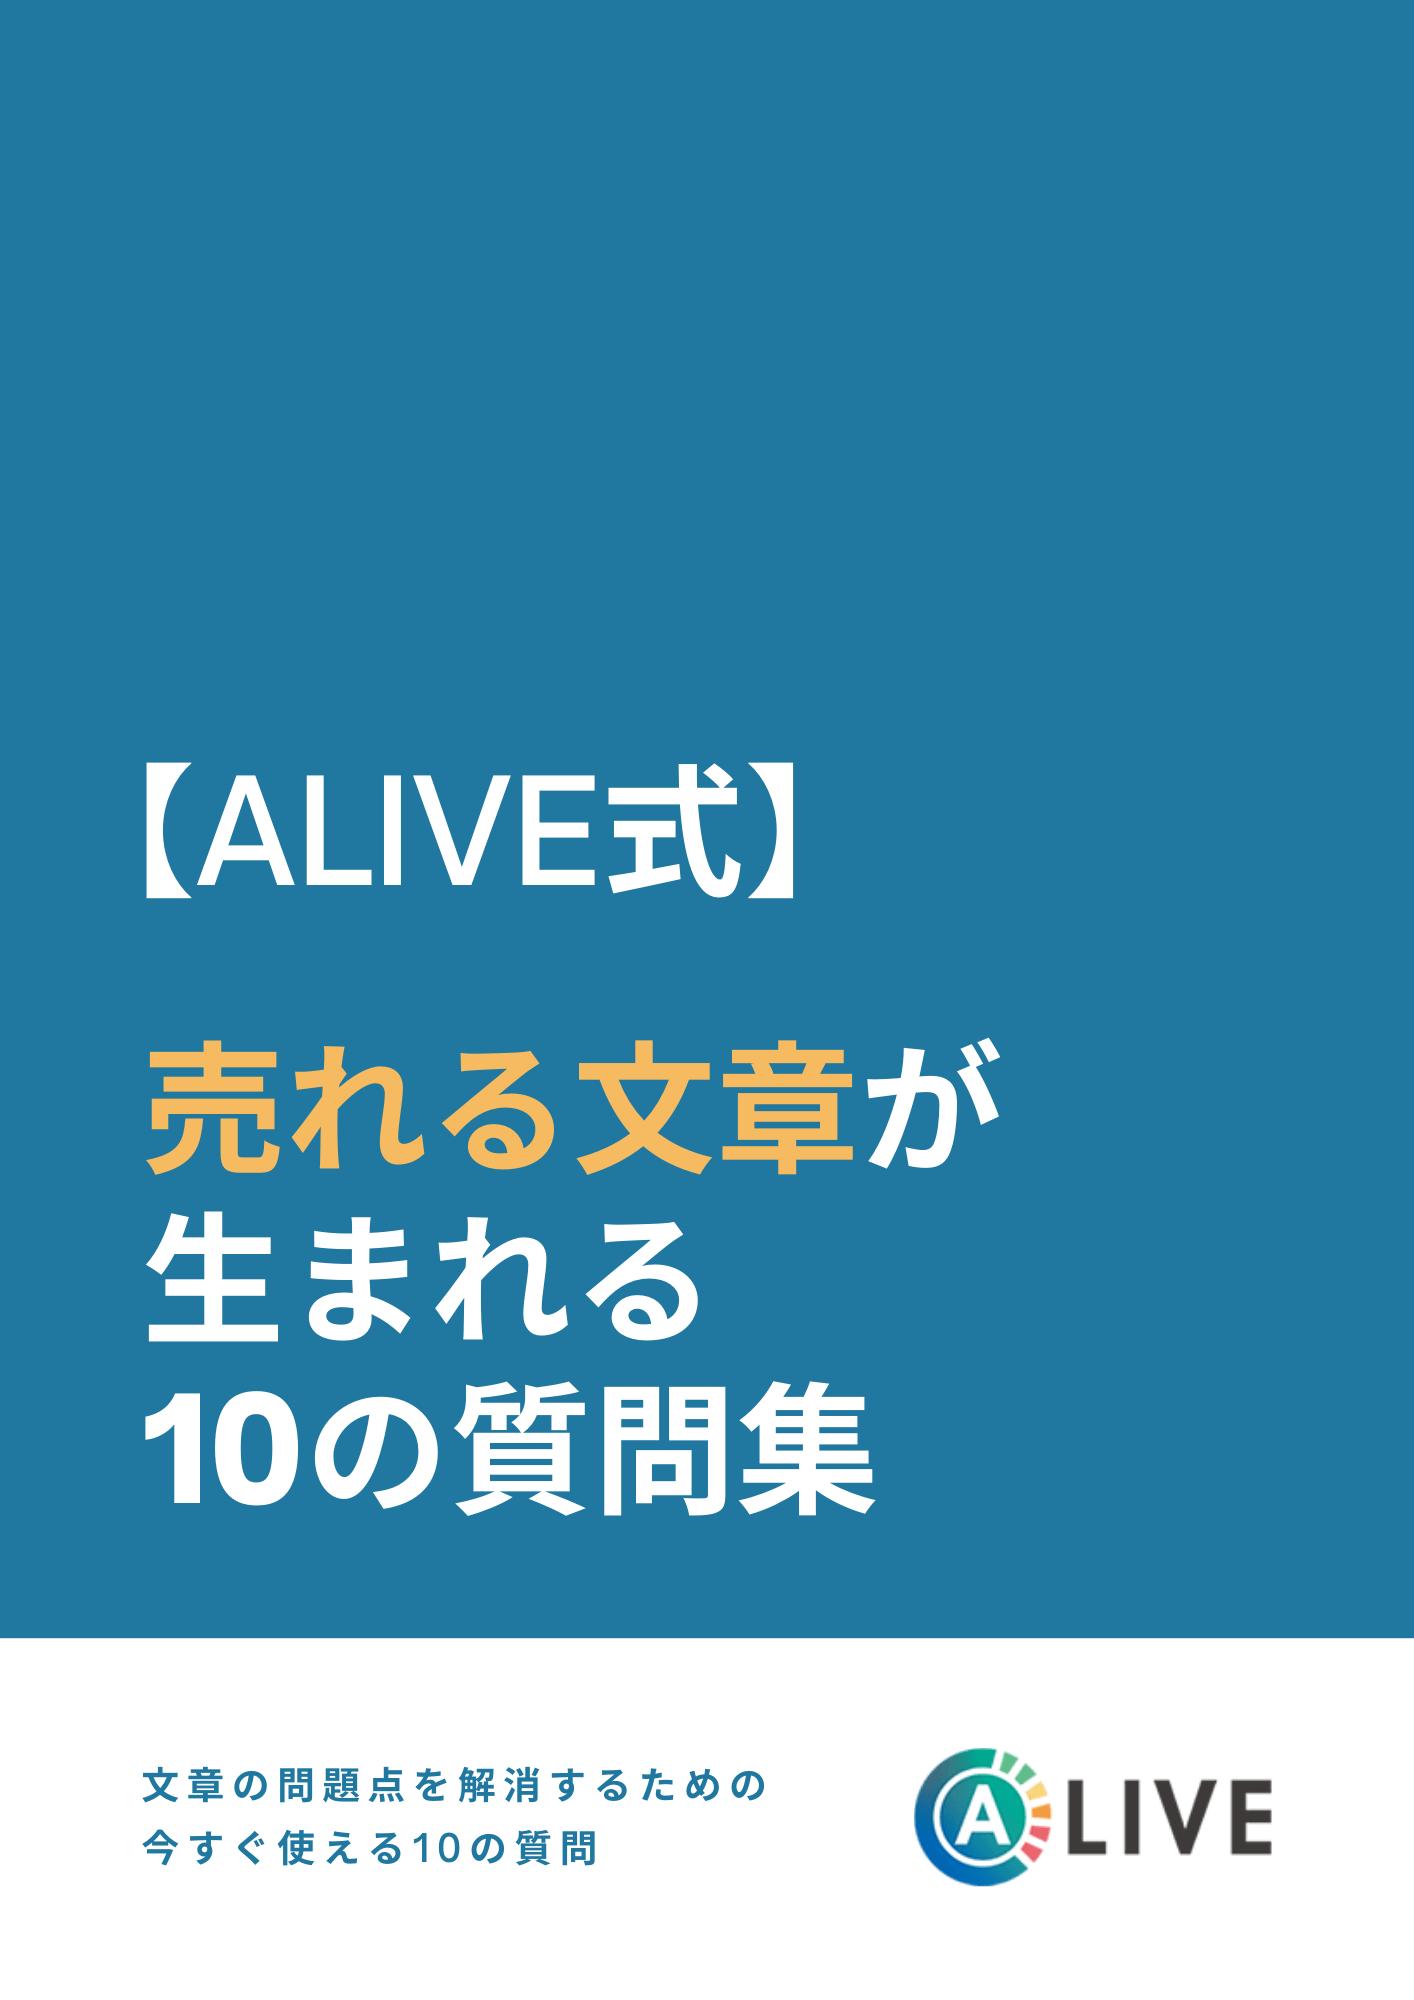 【ALIVE式】売れる文章が生まれる10の質問集